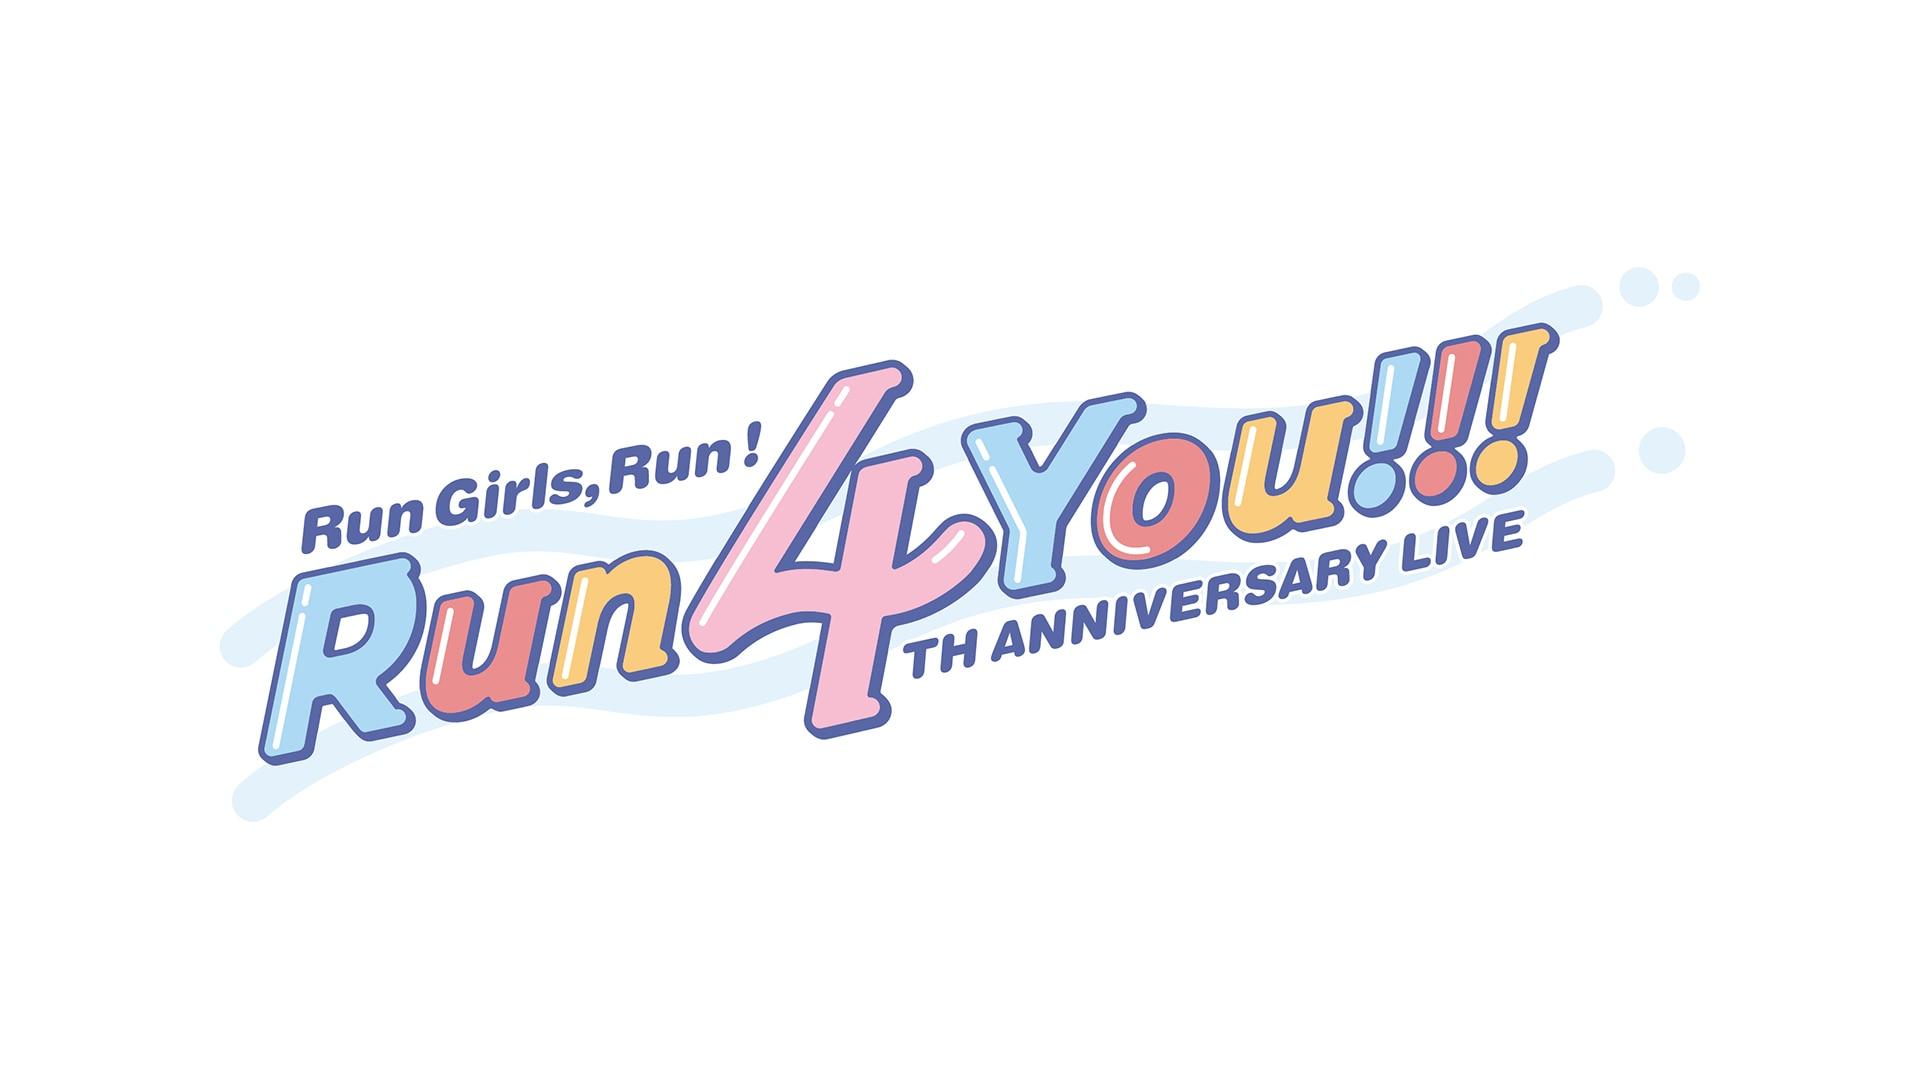 「Run Girls, Run!4th Anniversary LIVE Run 4 You!!!」公演における祝い花及びプレゼントに関してのご案内